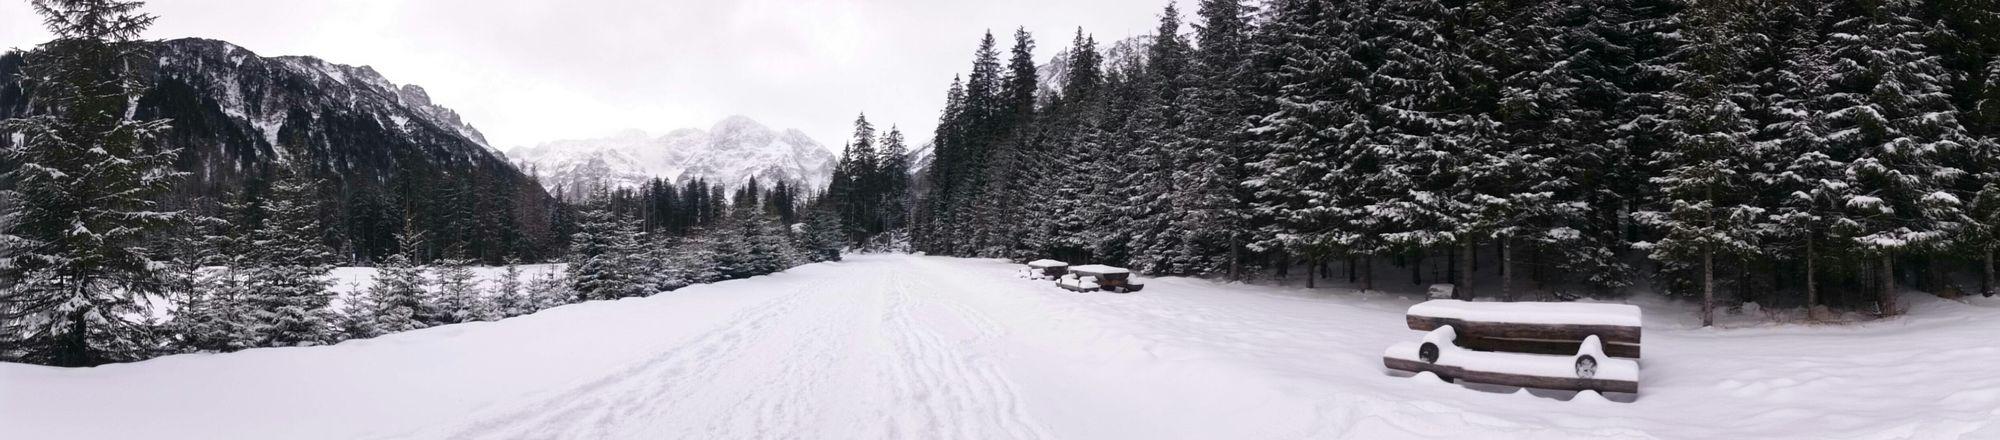 Snow Simplicity Winter MyPhotography Polishgirl Poland Mountains Tatry Morskieoko Showcase: February Alone